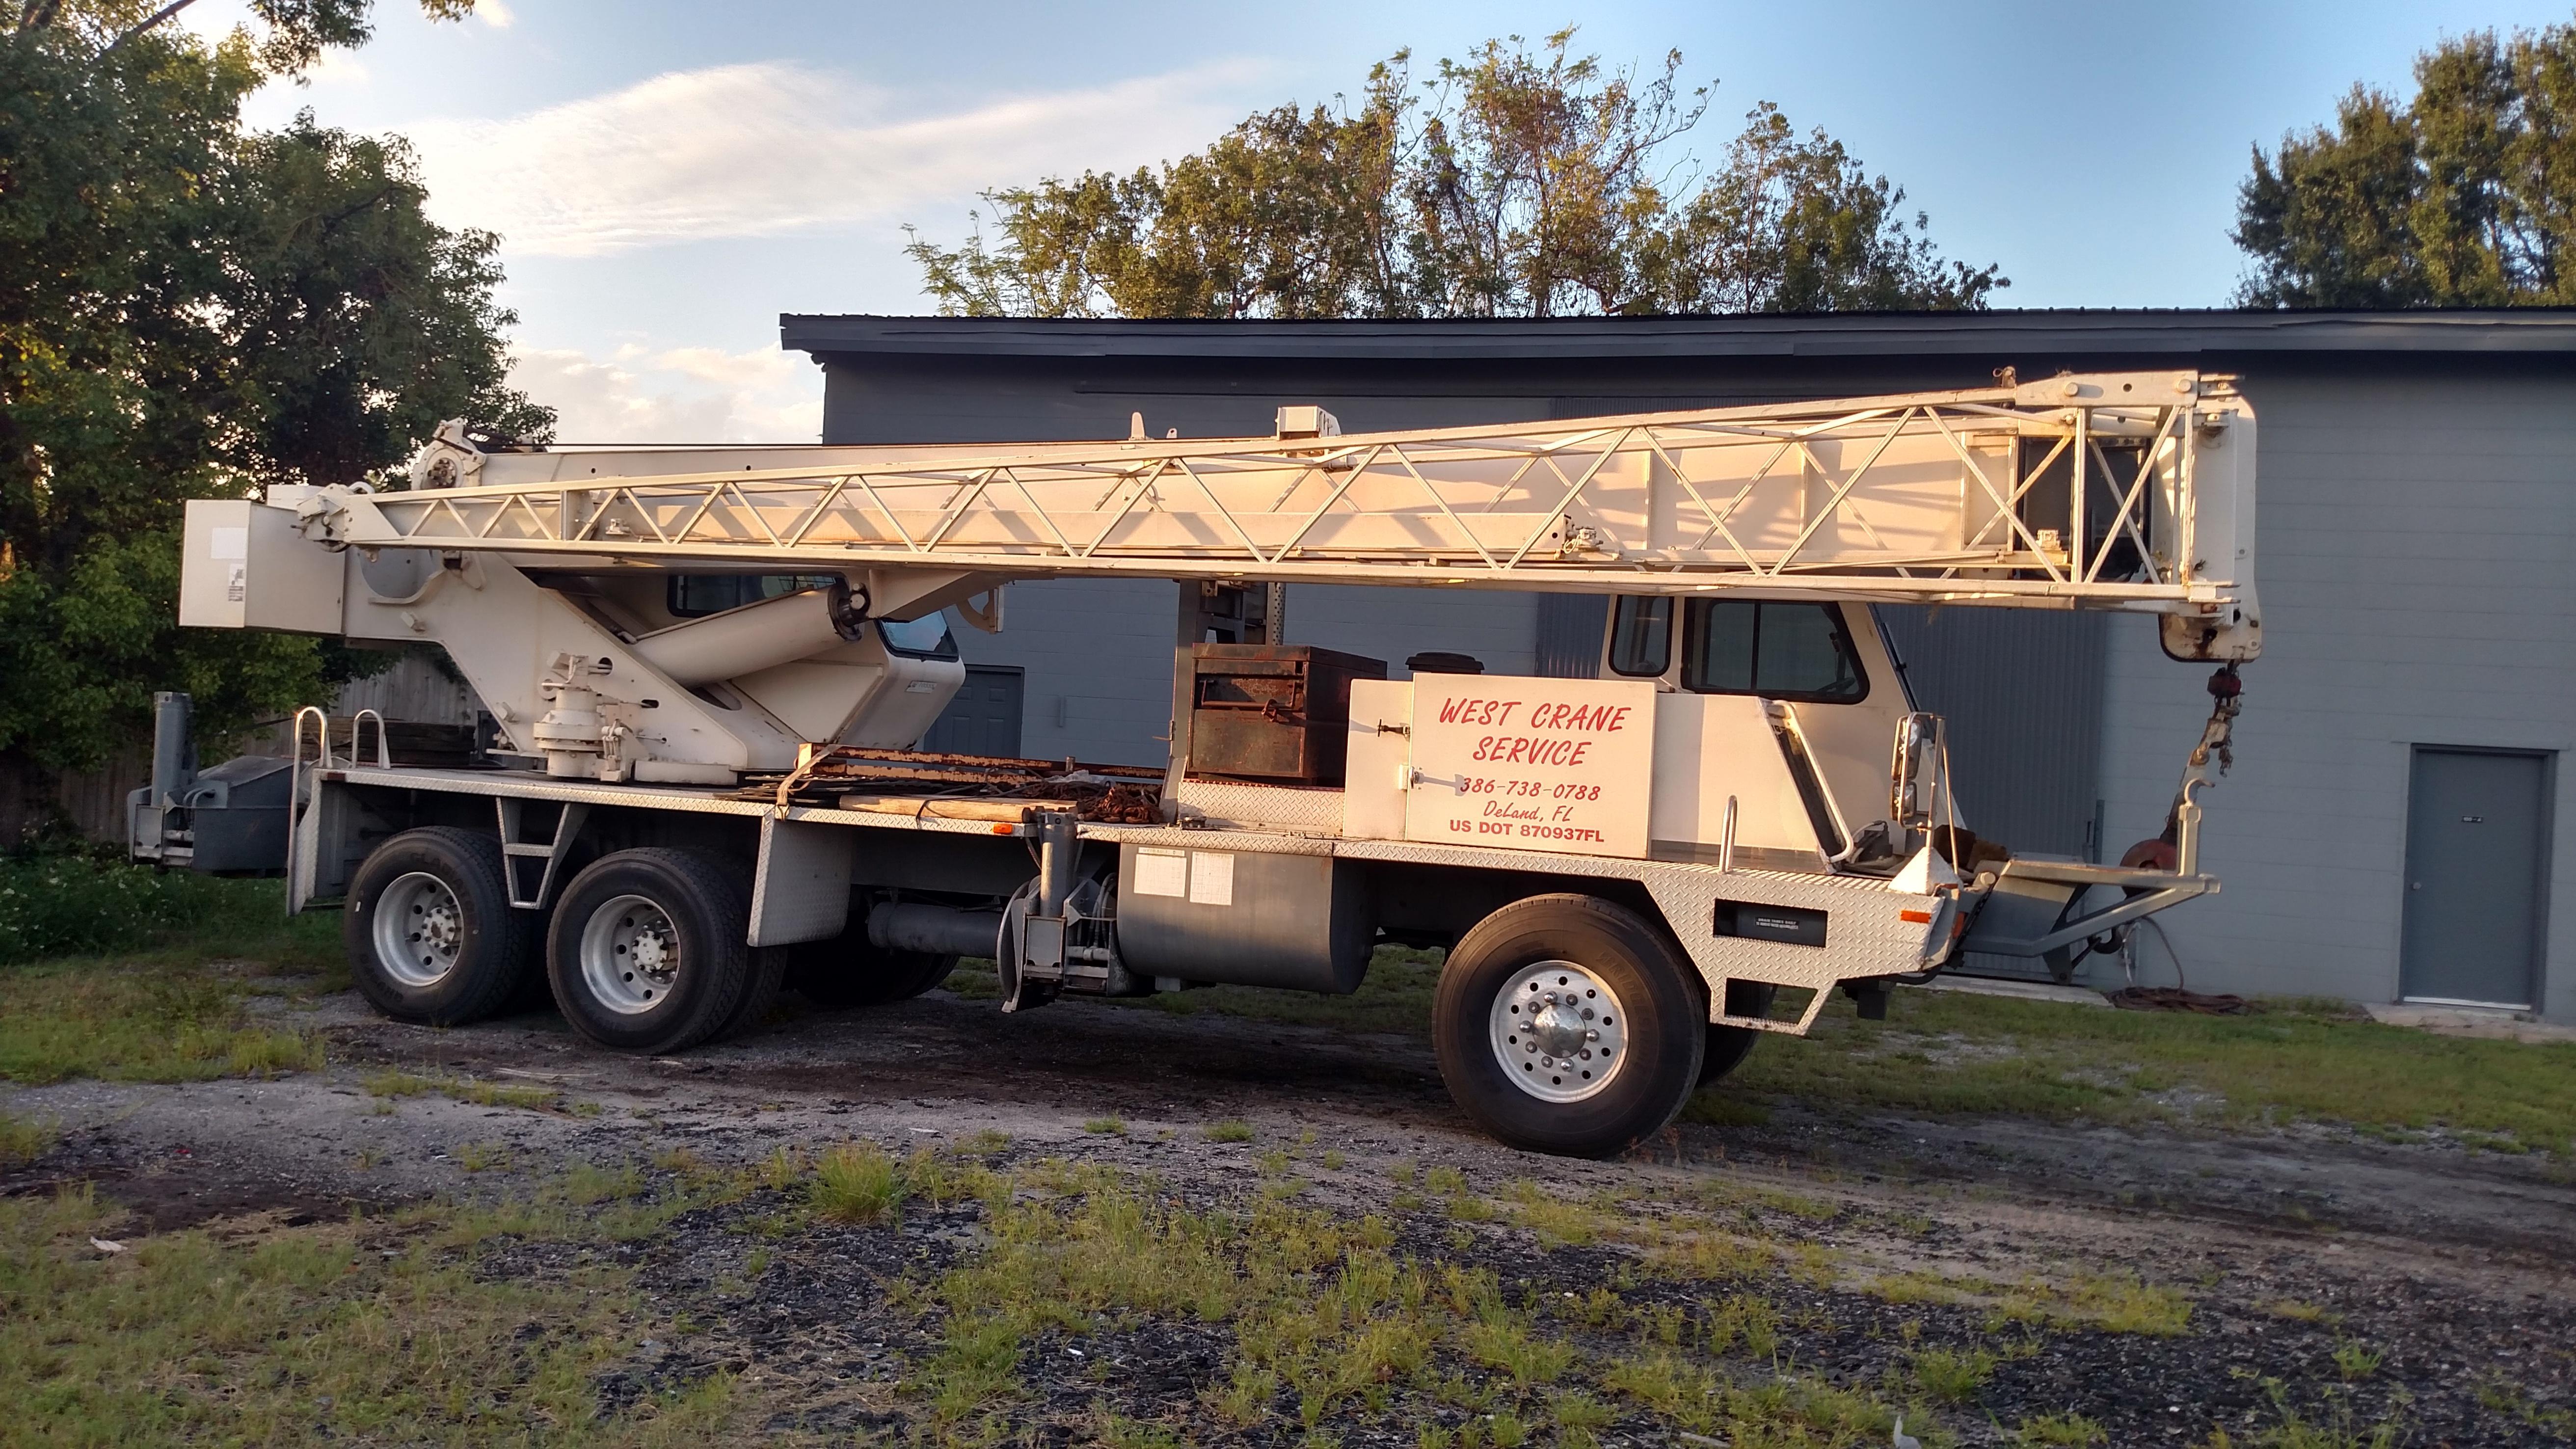 Agin Crane Service image 17